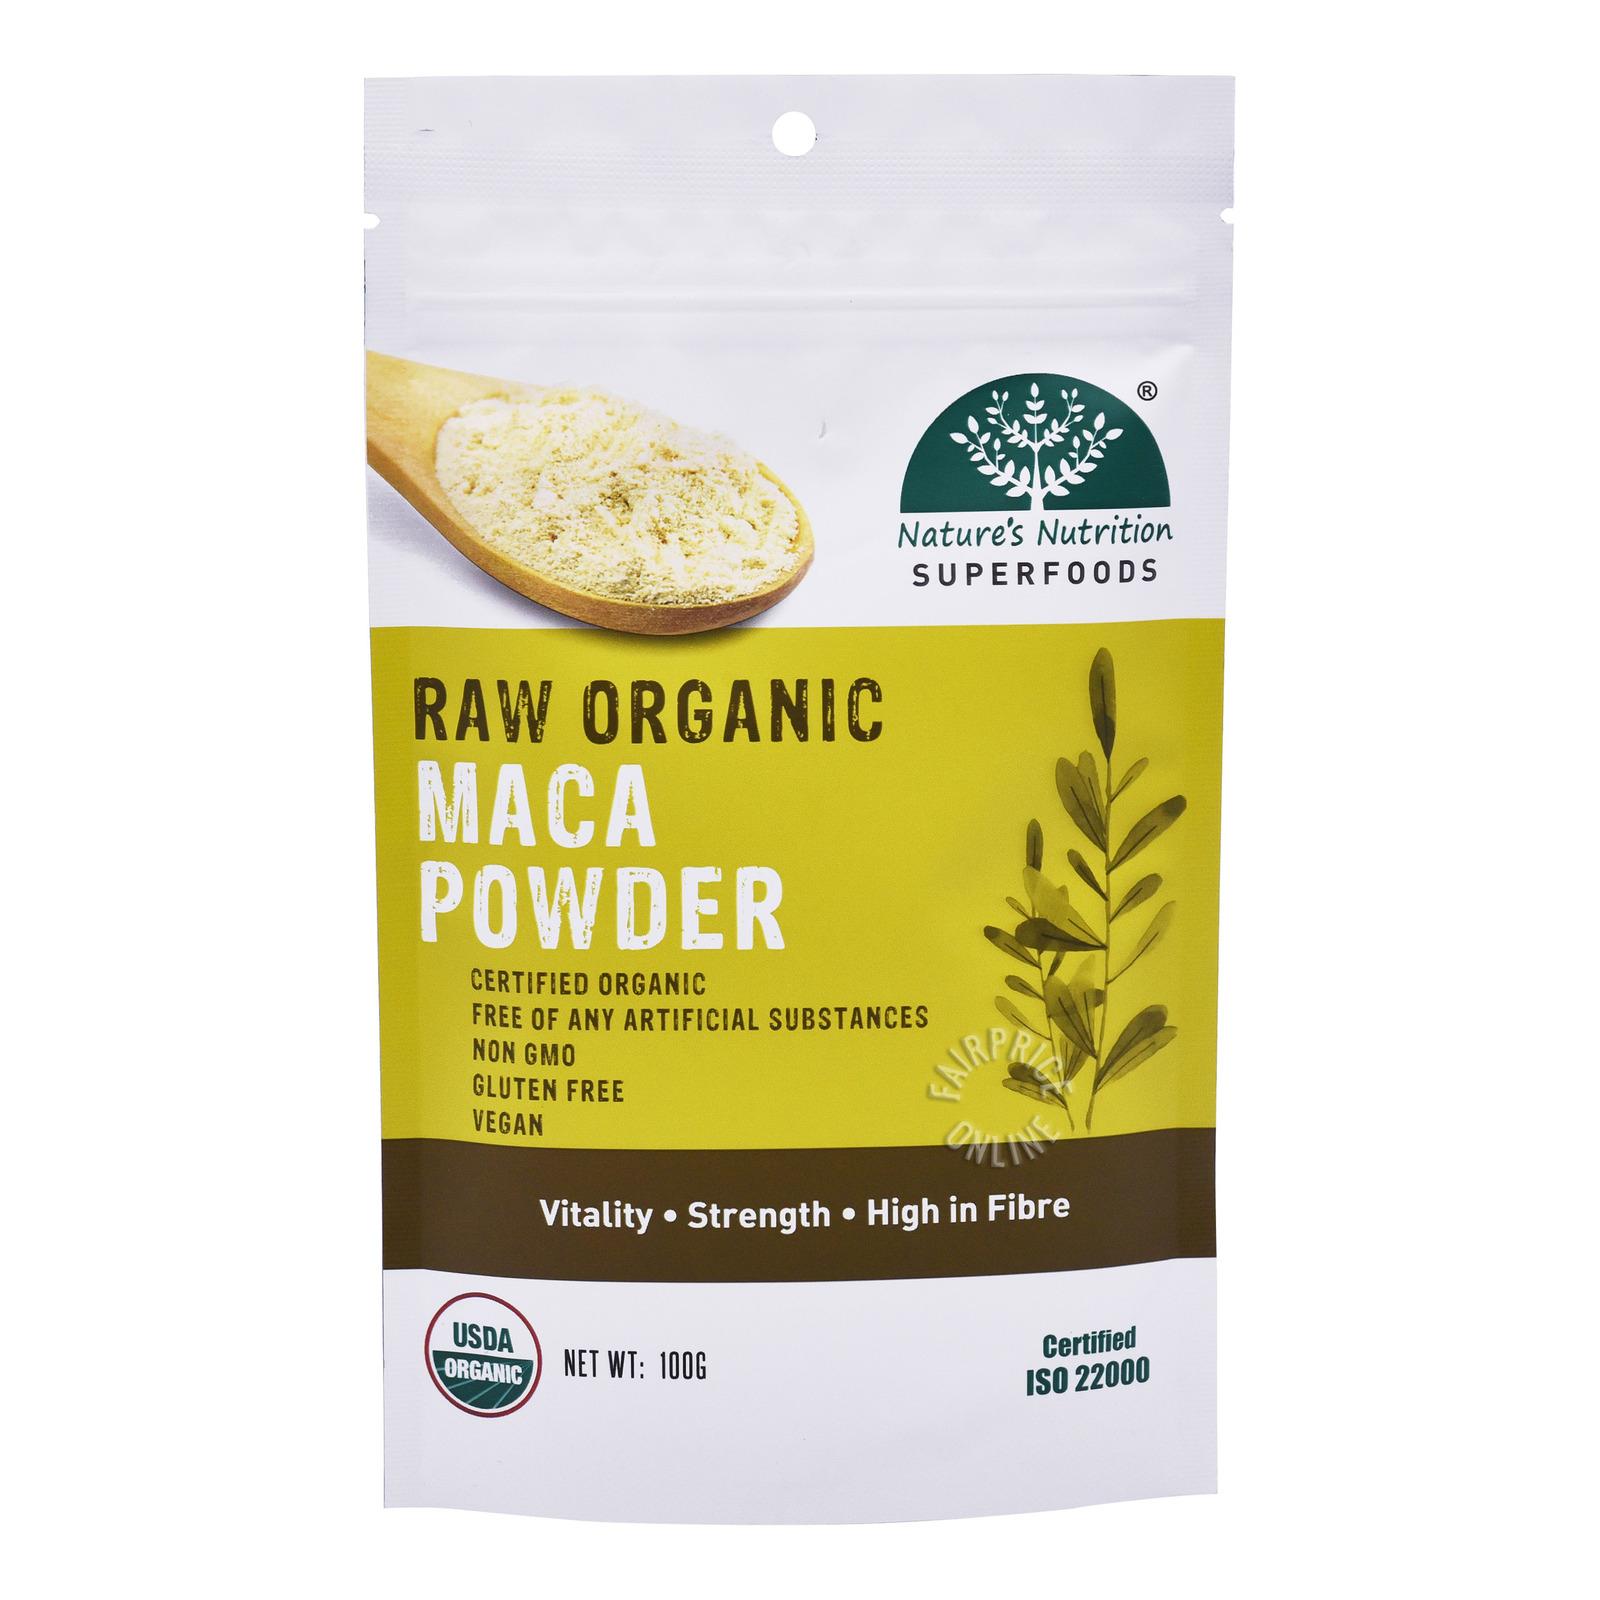 Nature's Nutrition Superfoods - Raw Organic Maca Powder